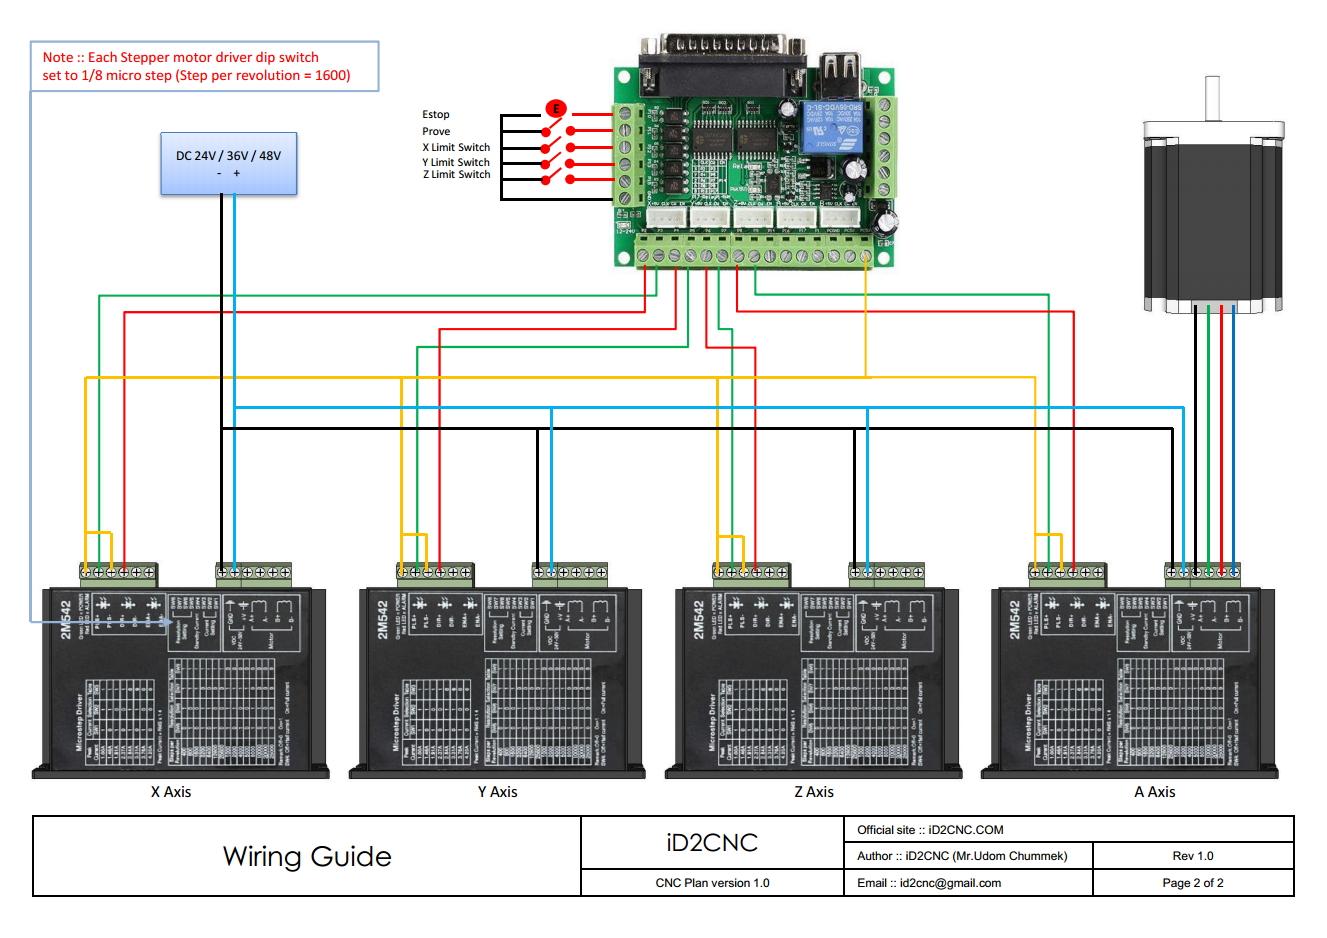 Mach3 Cnc Wiring Diagram - Wiring Diagram Perfomance on